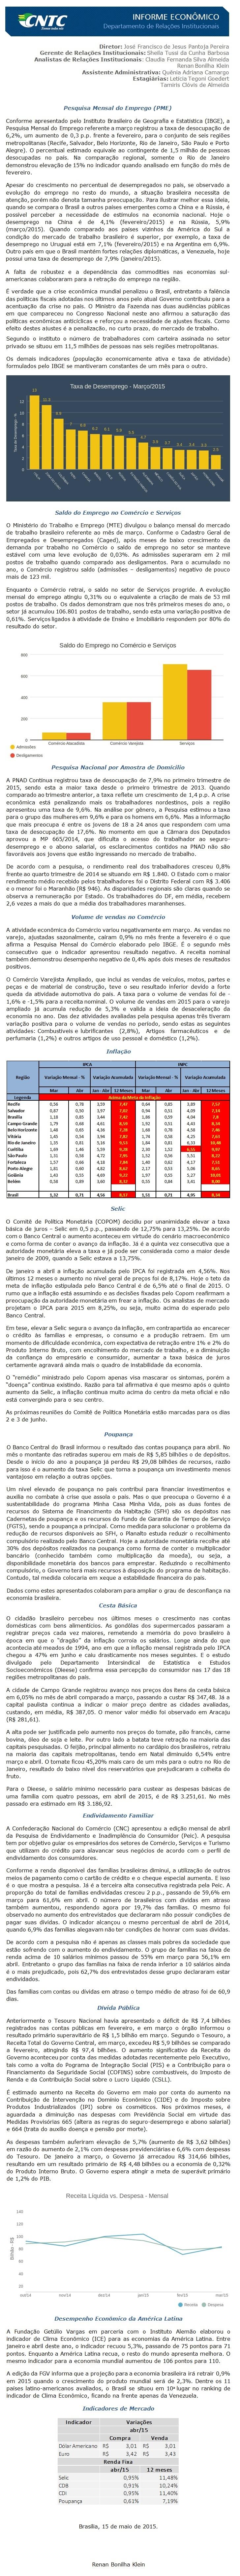 Informe Econômico 11